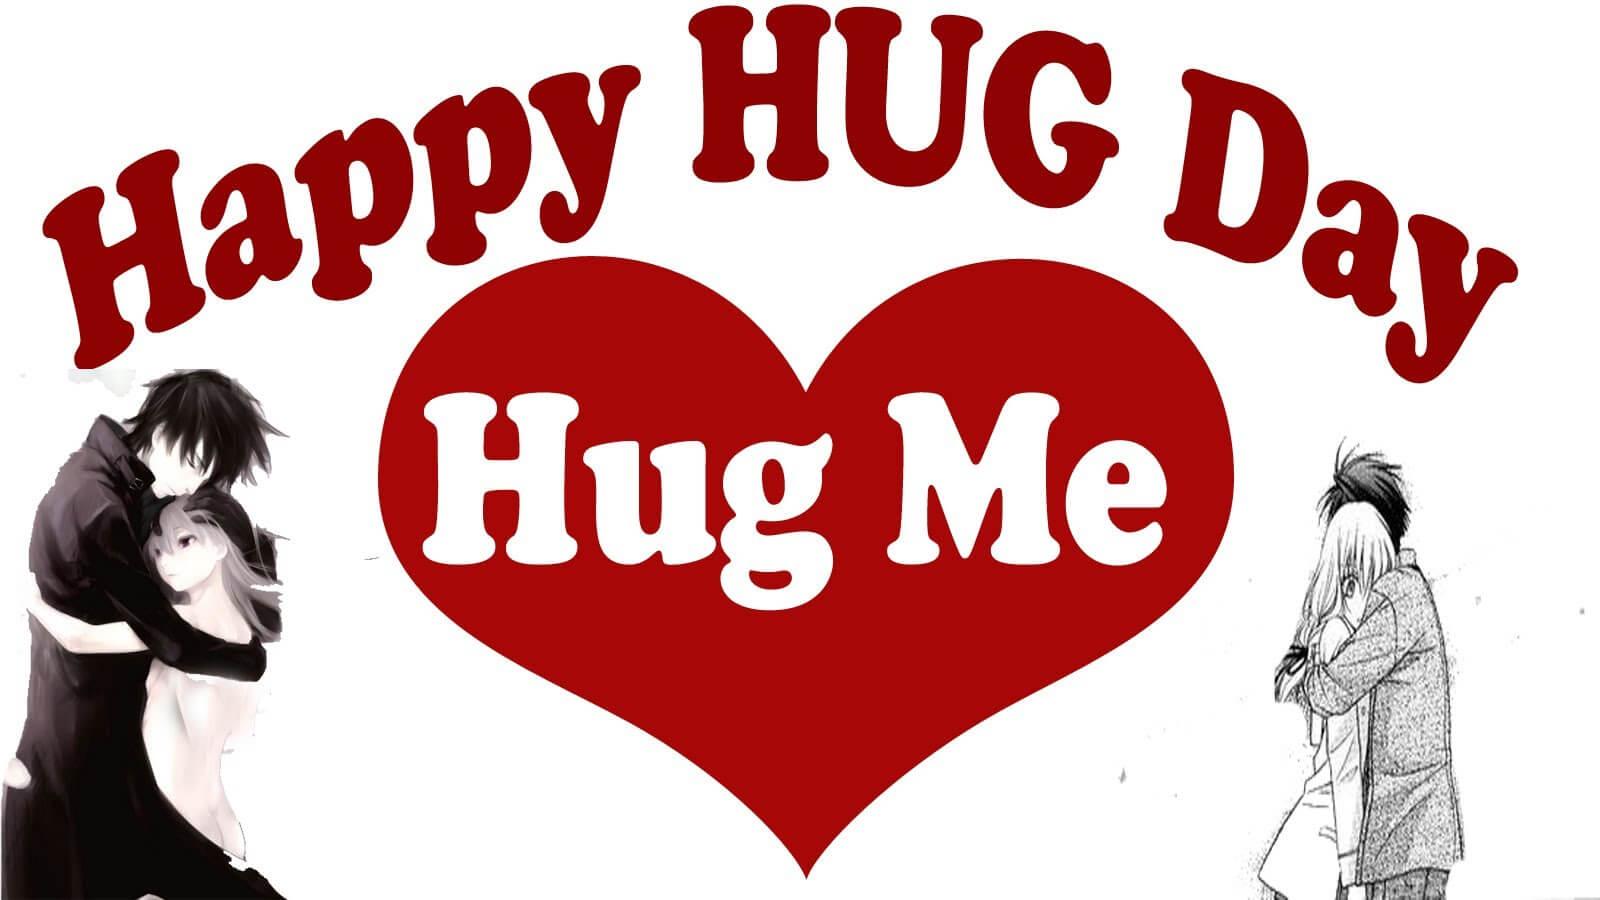 happy hug day hug me text displayed in heart image hd wallpaper